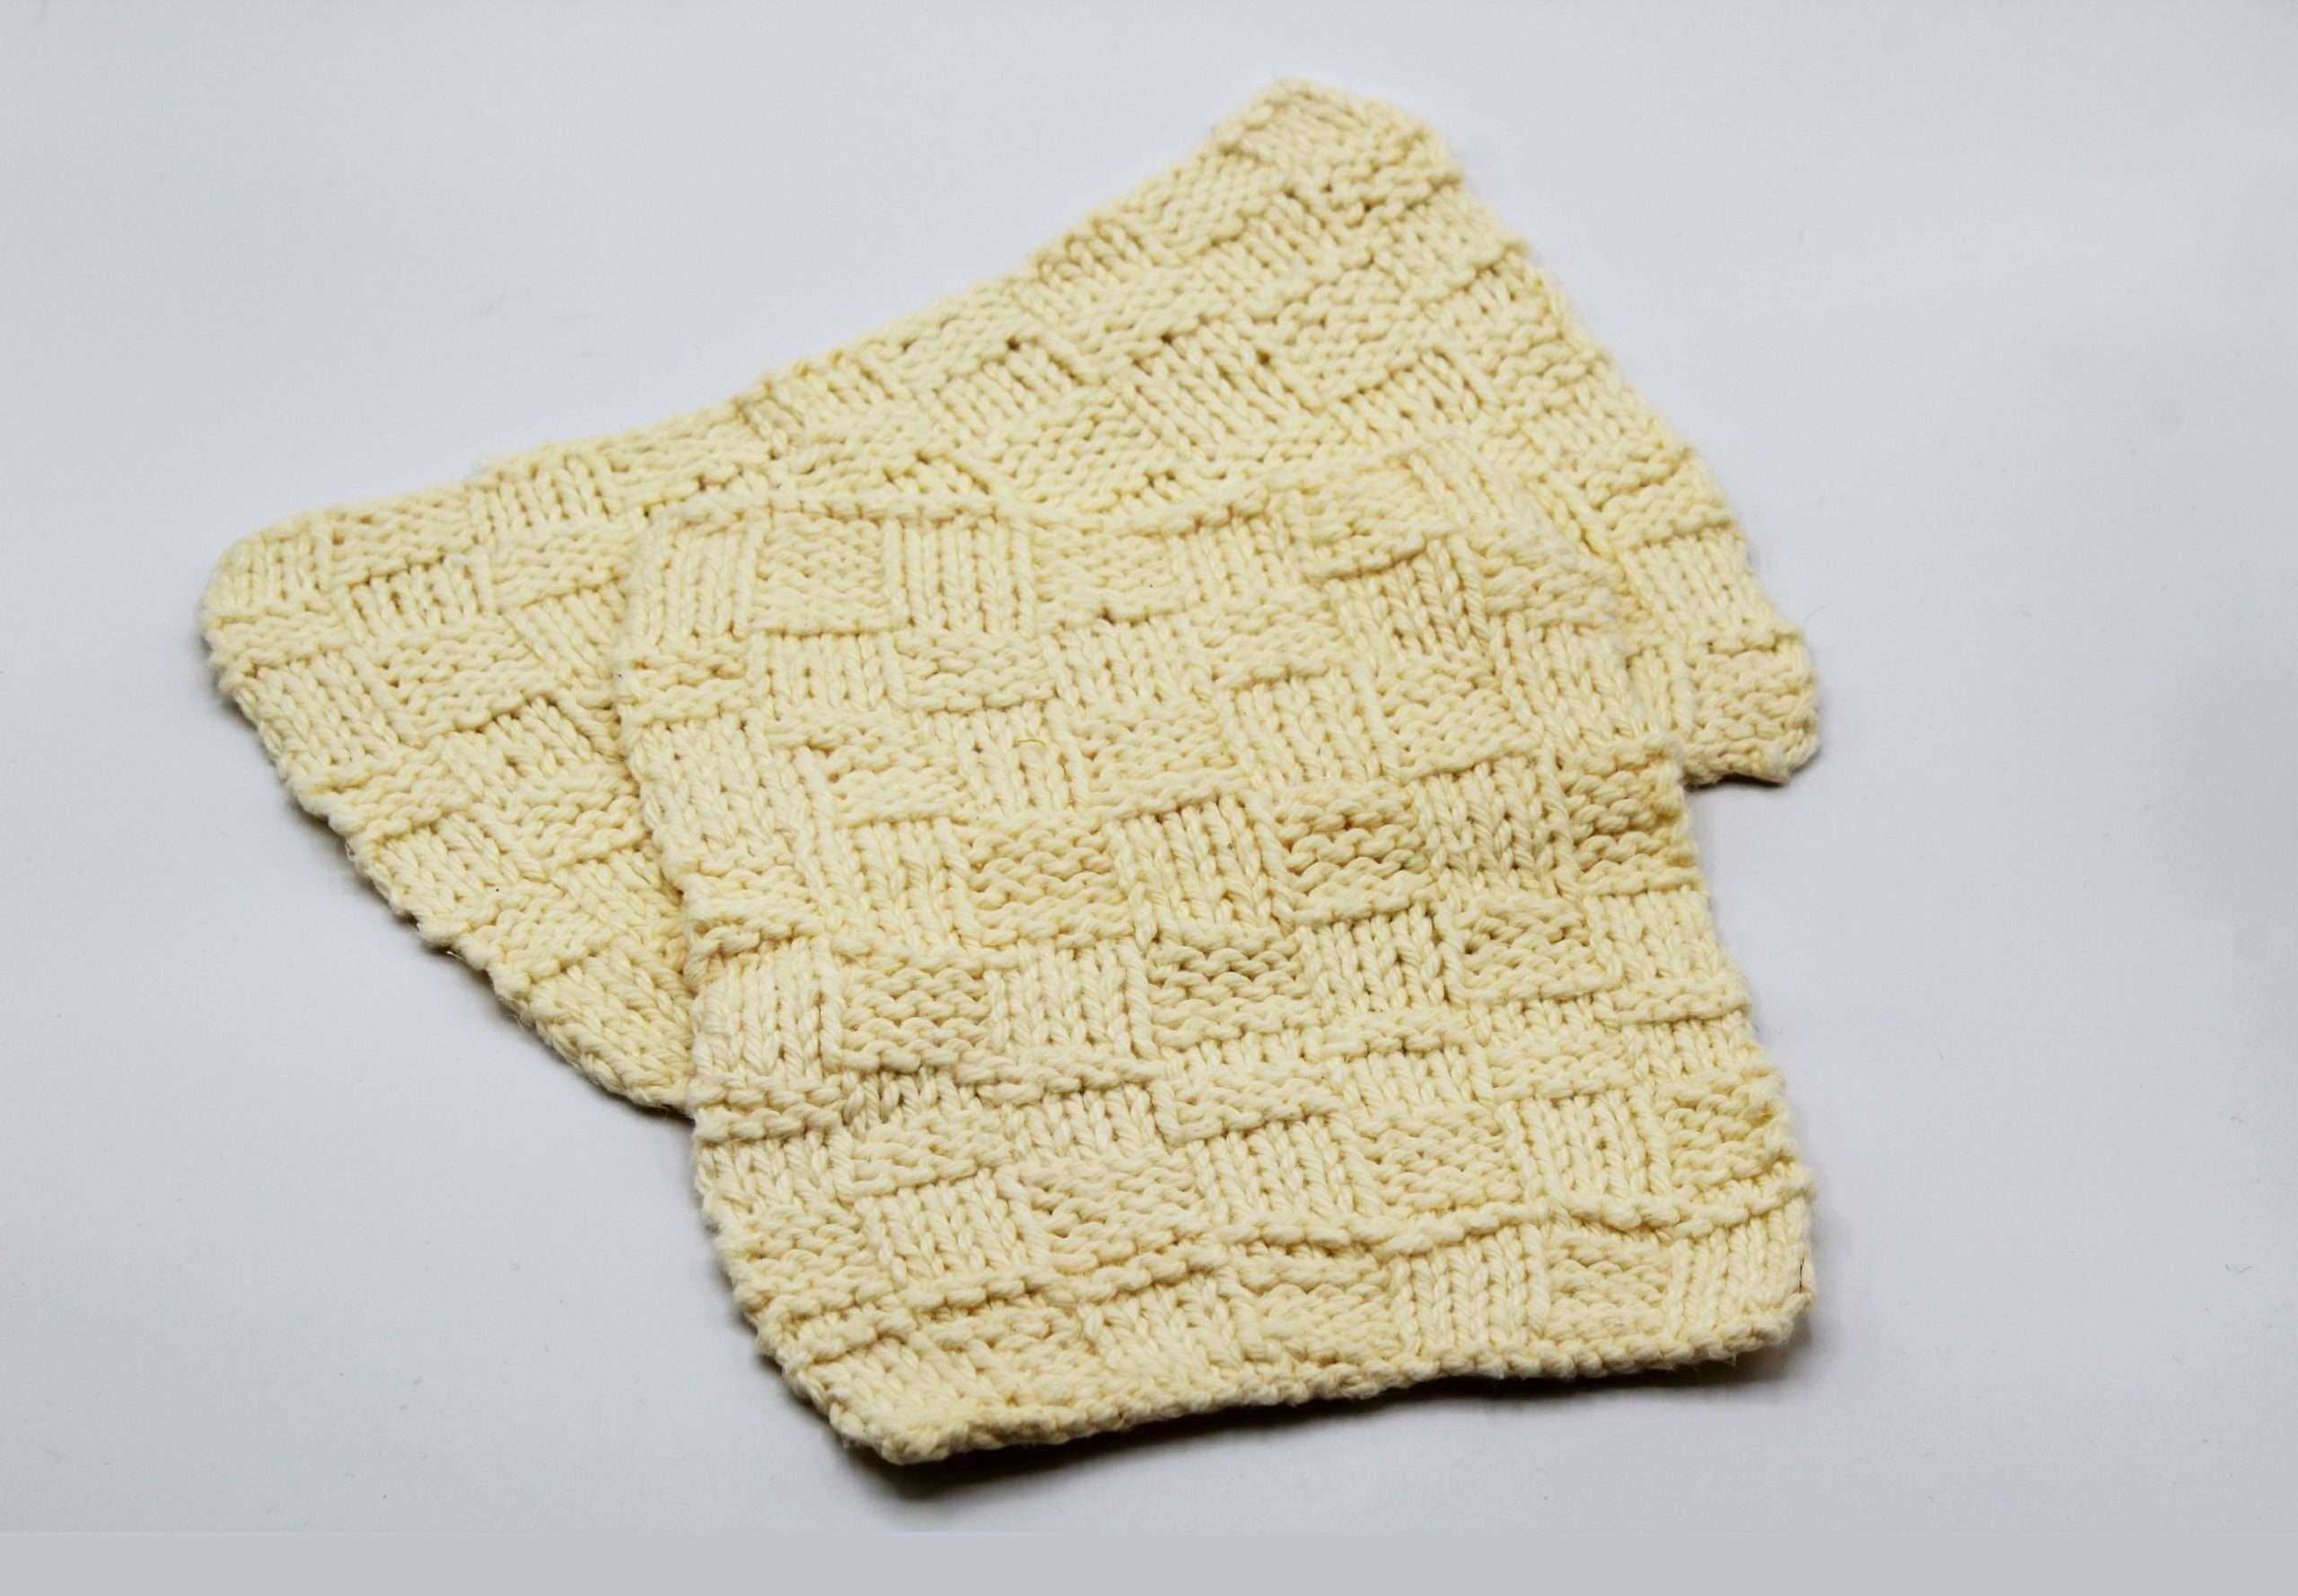 1940s Vintage Handmade Crochet Pot Holder Set of 2   Whispering City RVA